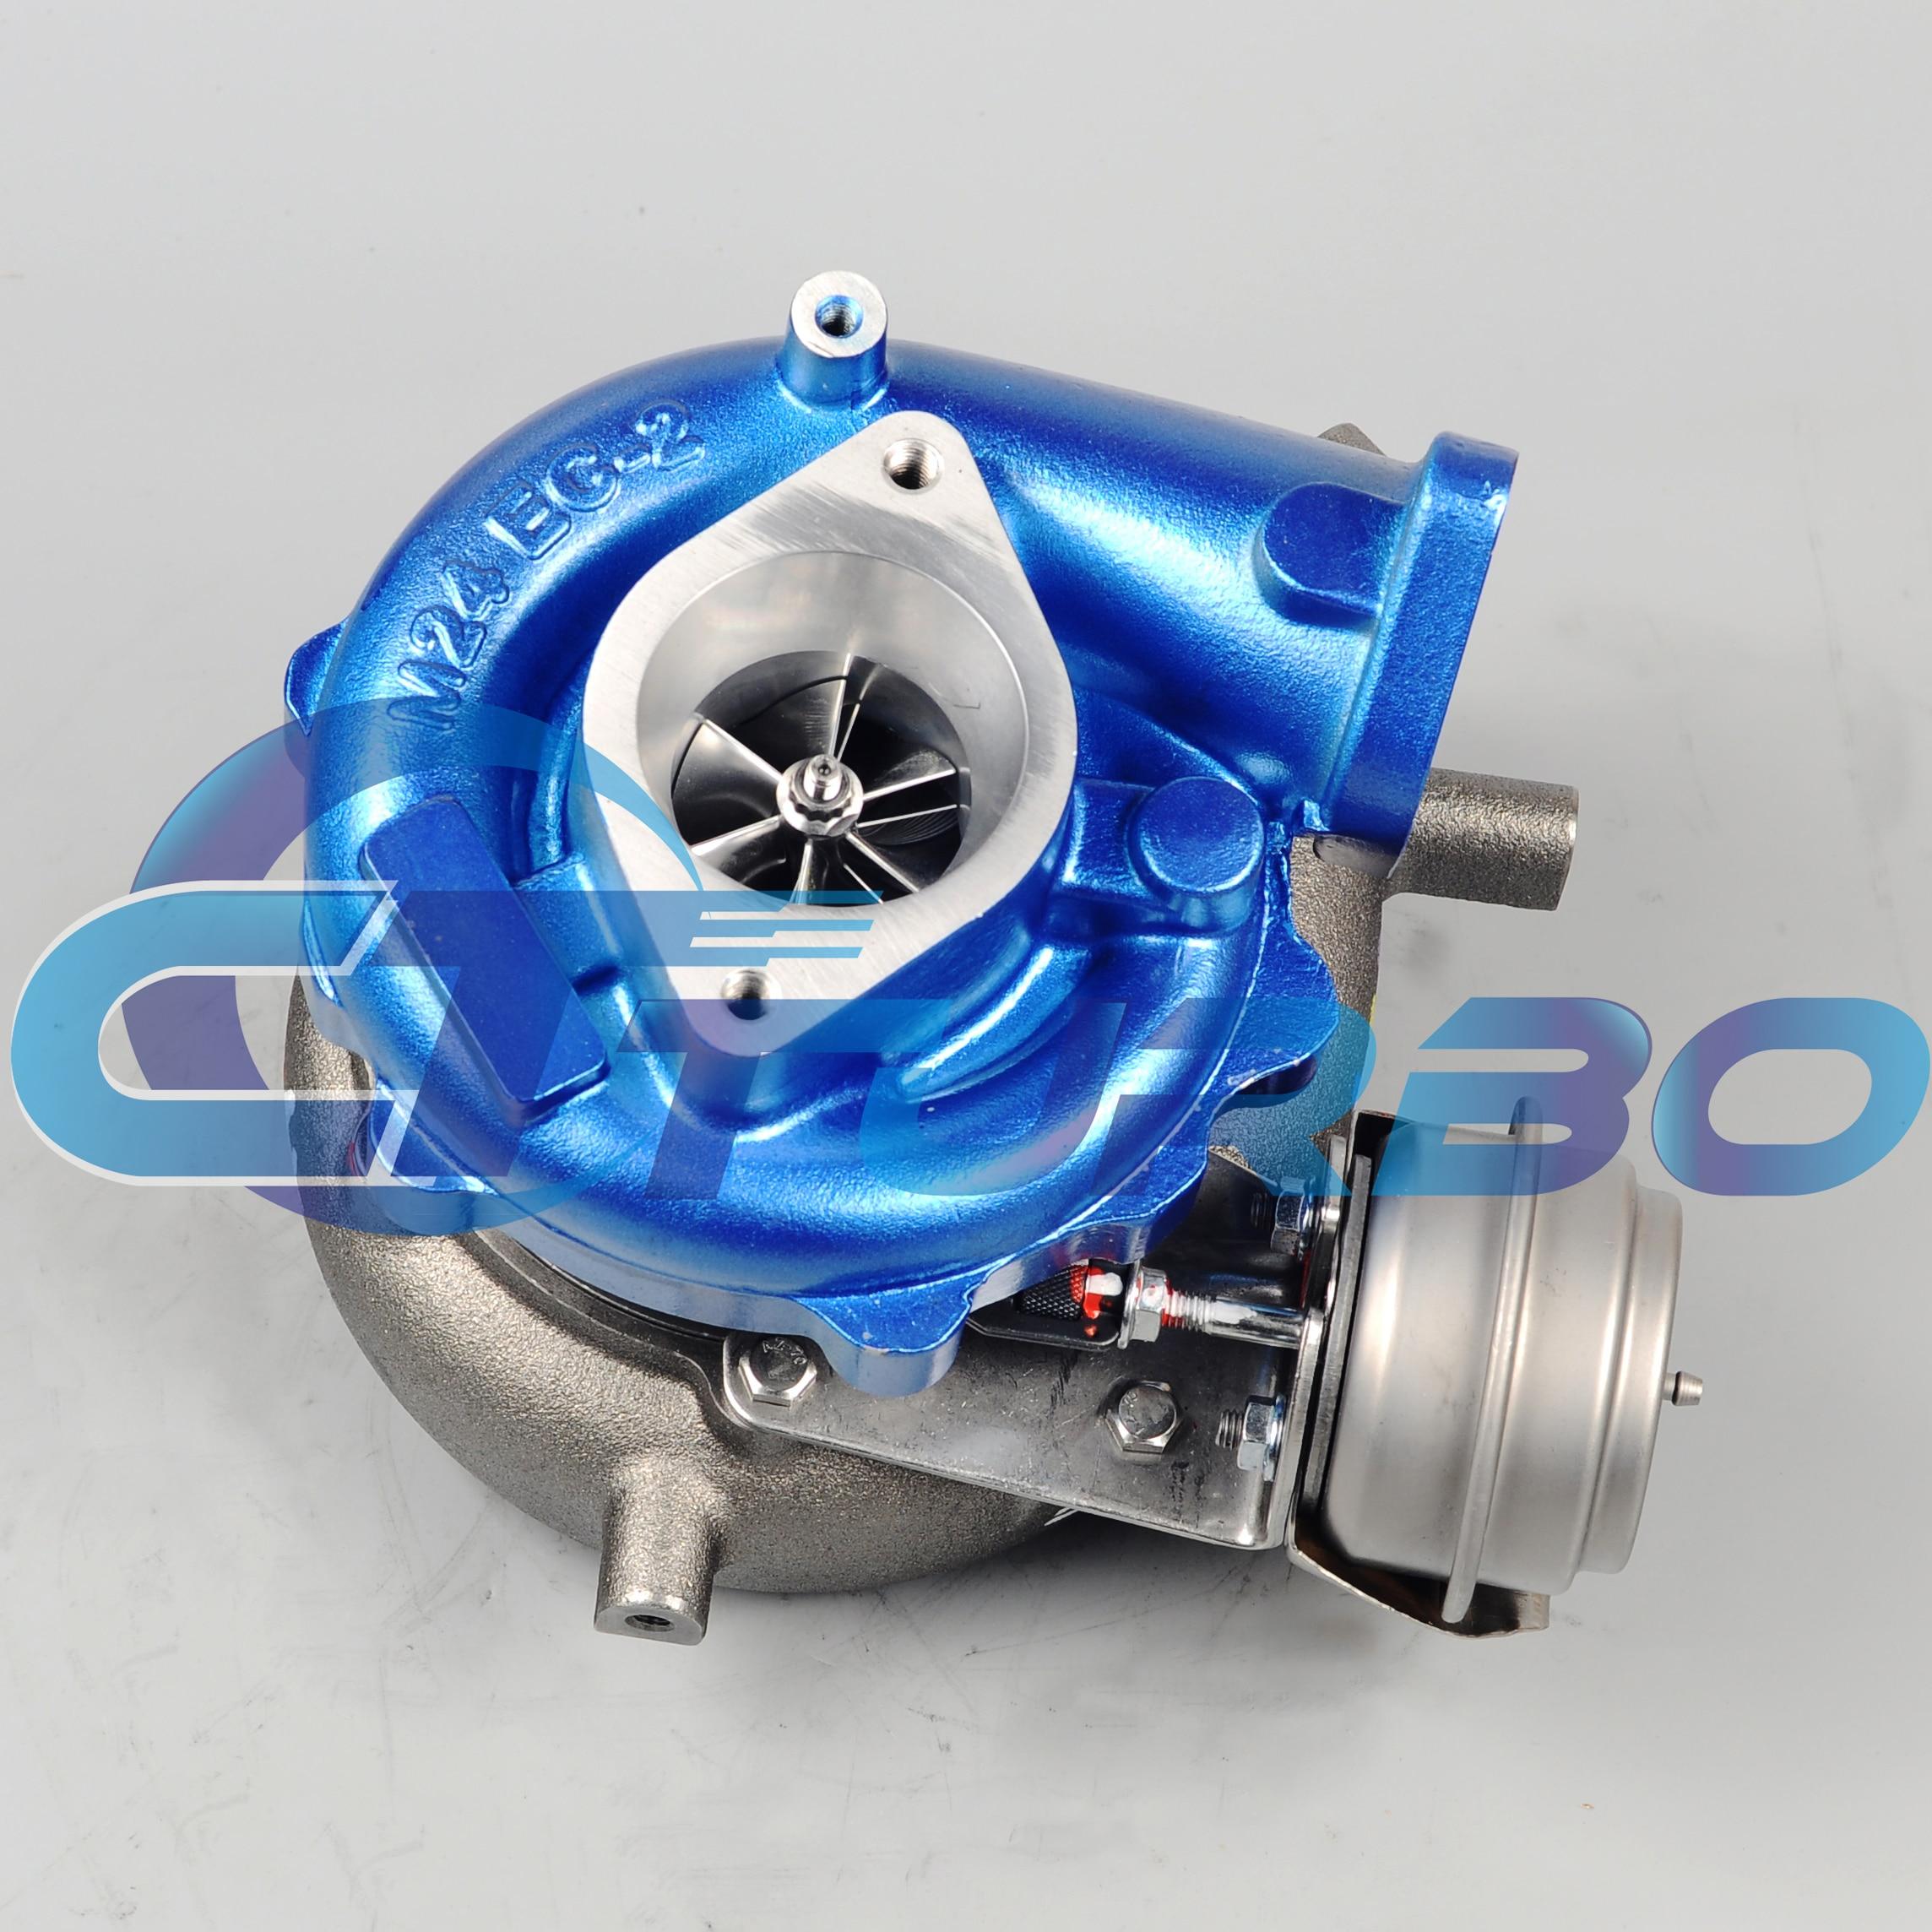 Cct Stage One High Flow Turbo Voor Nissan Navara D40 YD25